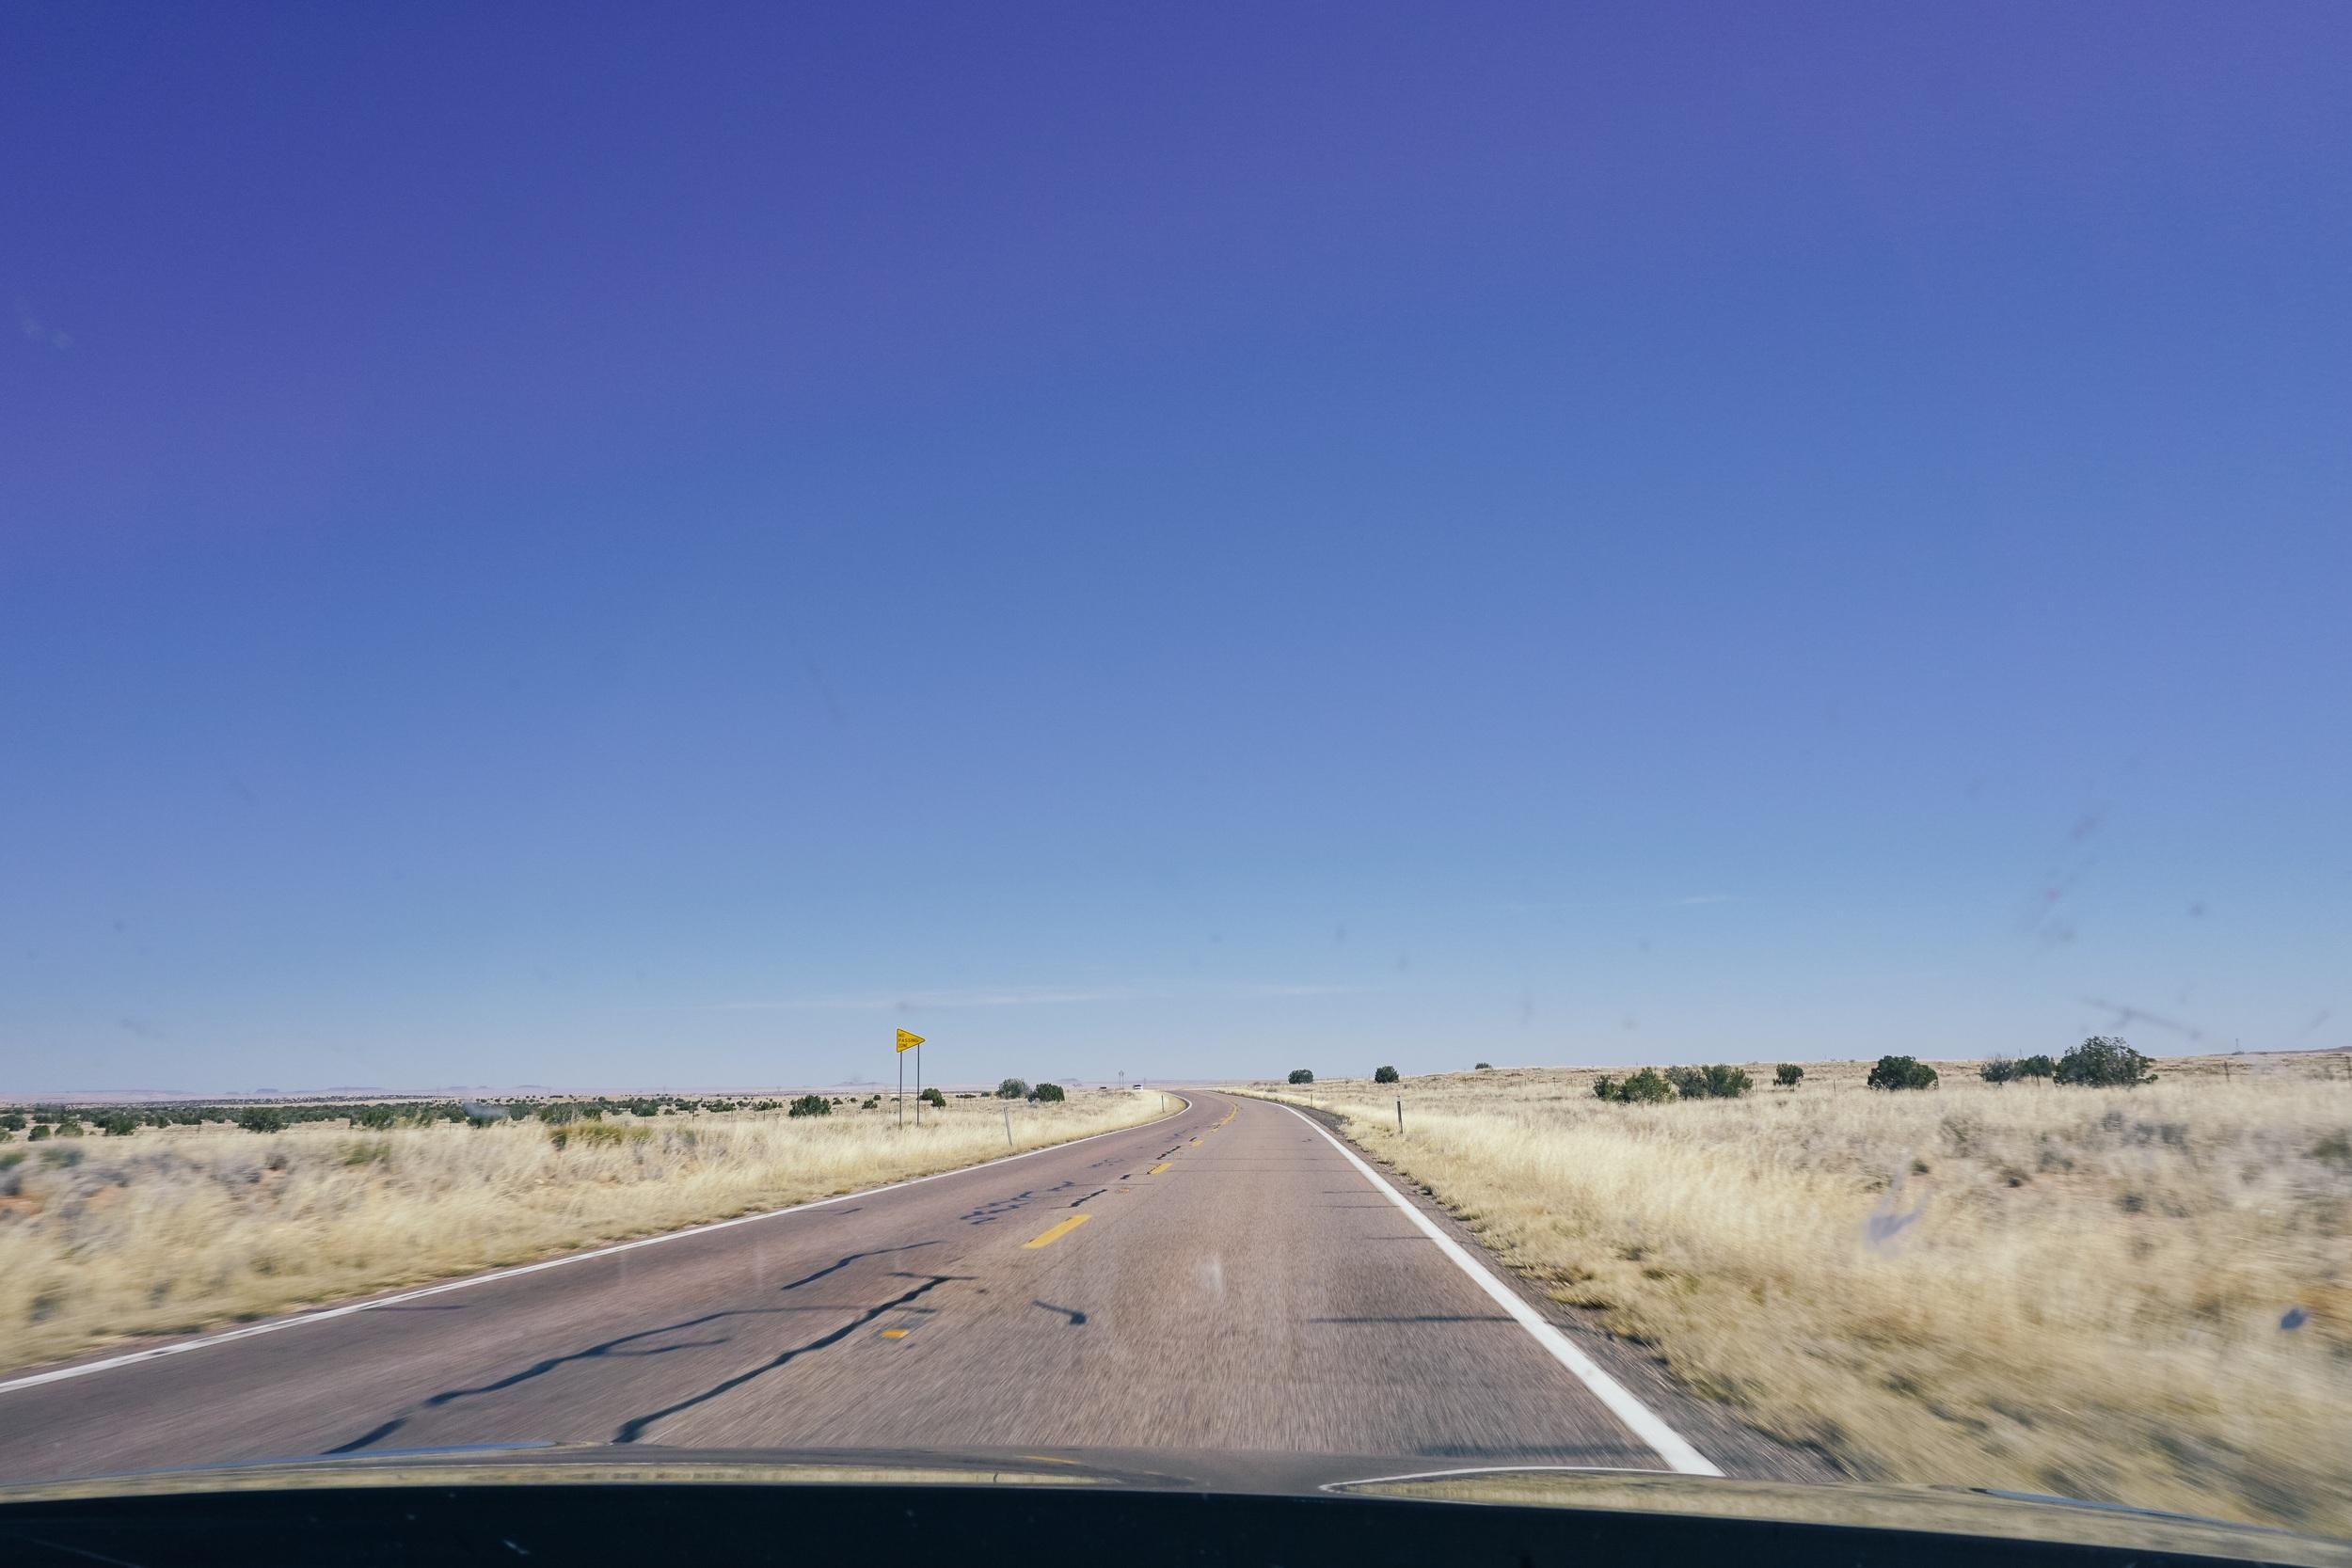 Road trip views